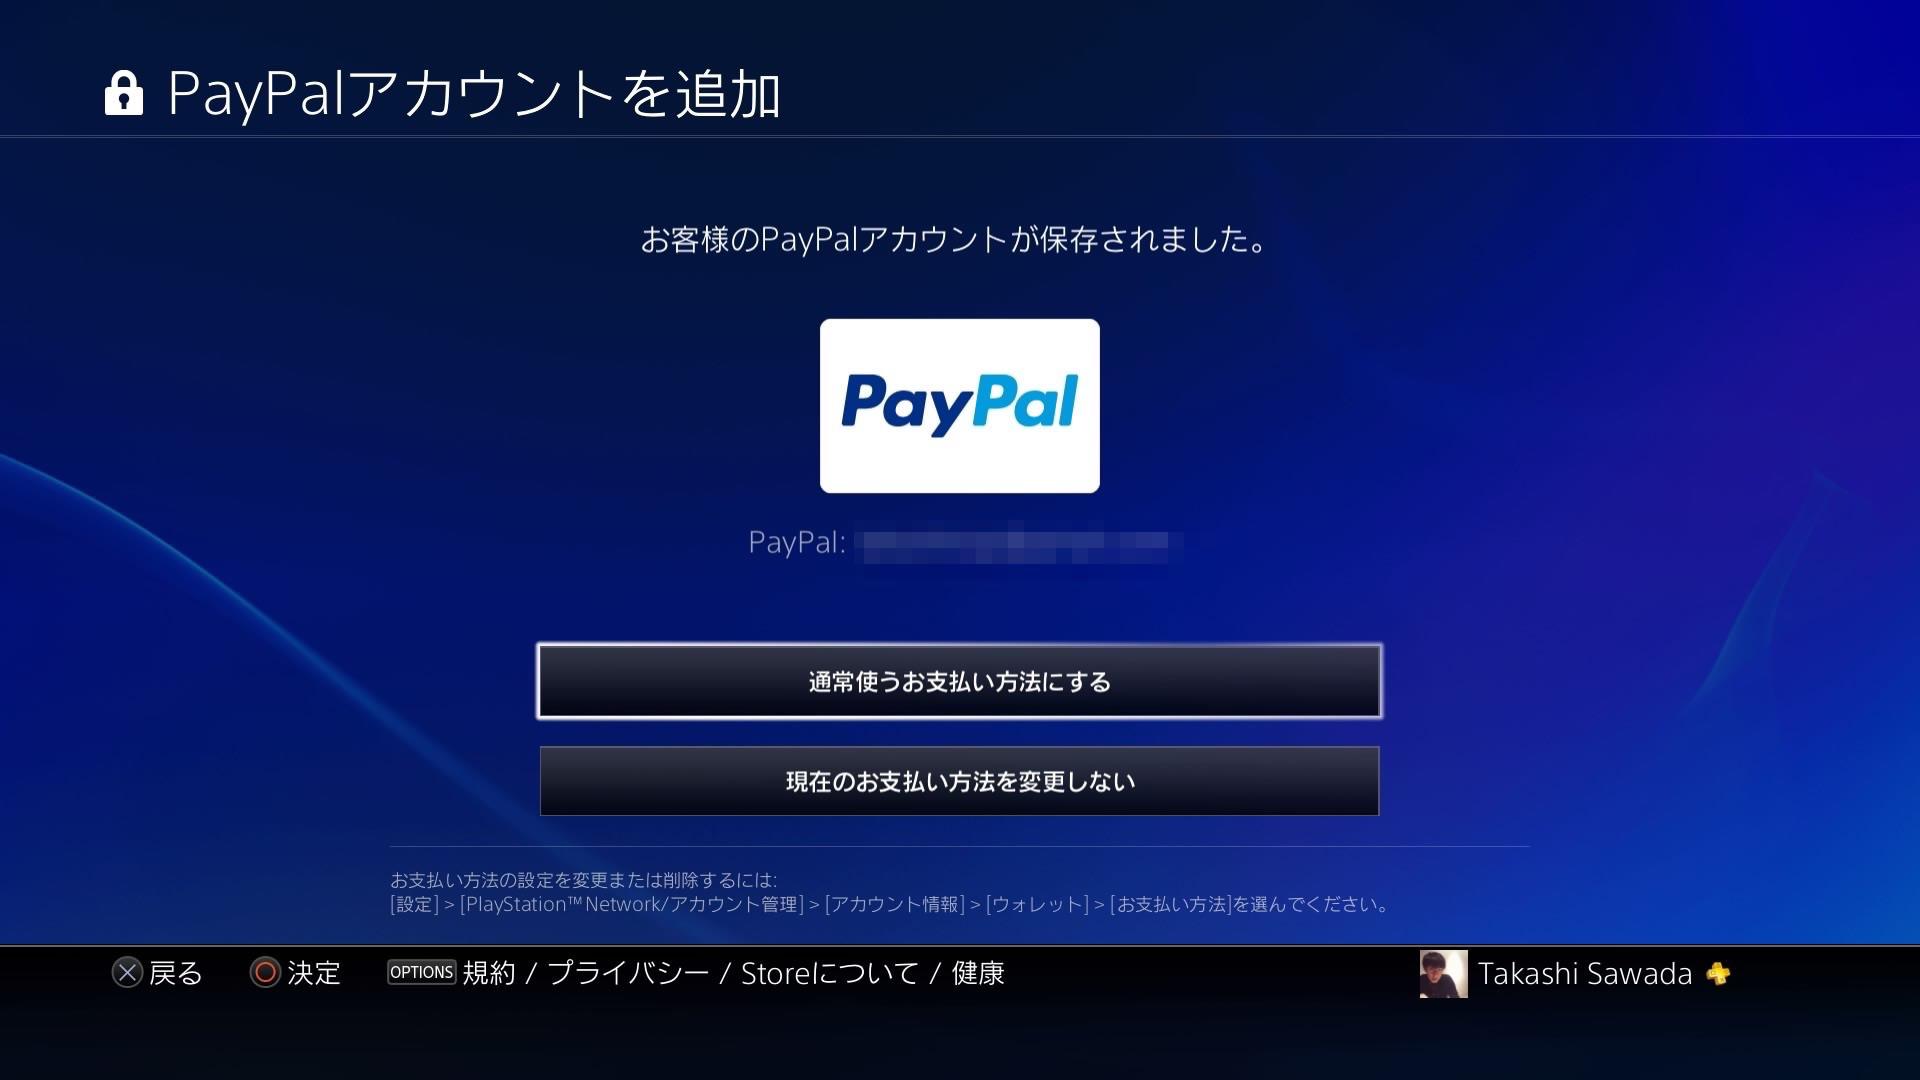 【PS4】PlayStation Storeの支払いをPayPal(ペイパル)にする方法   MIRAI STEREO